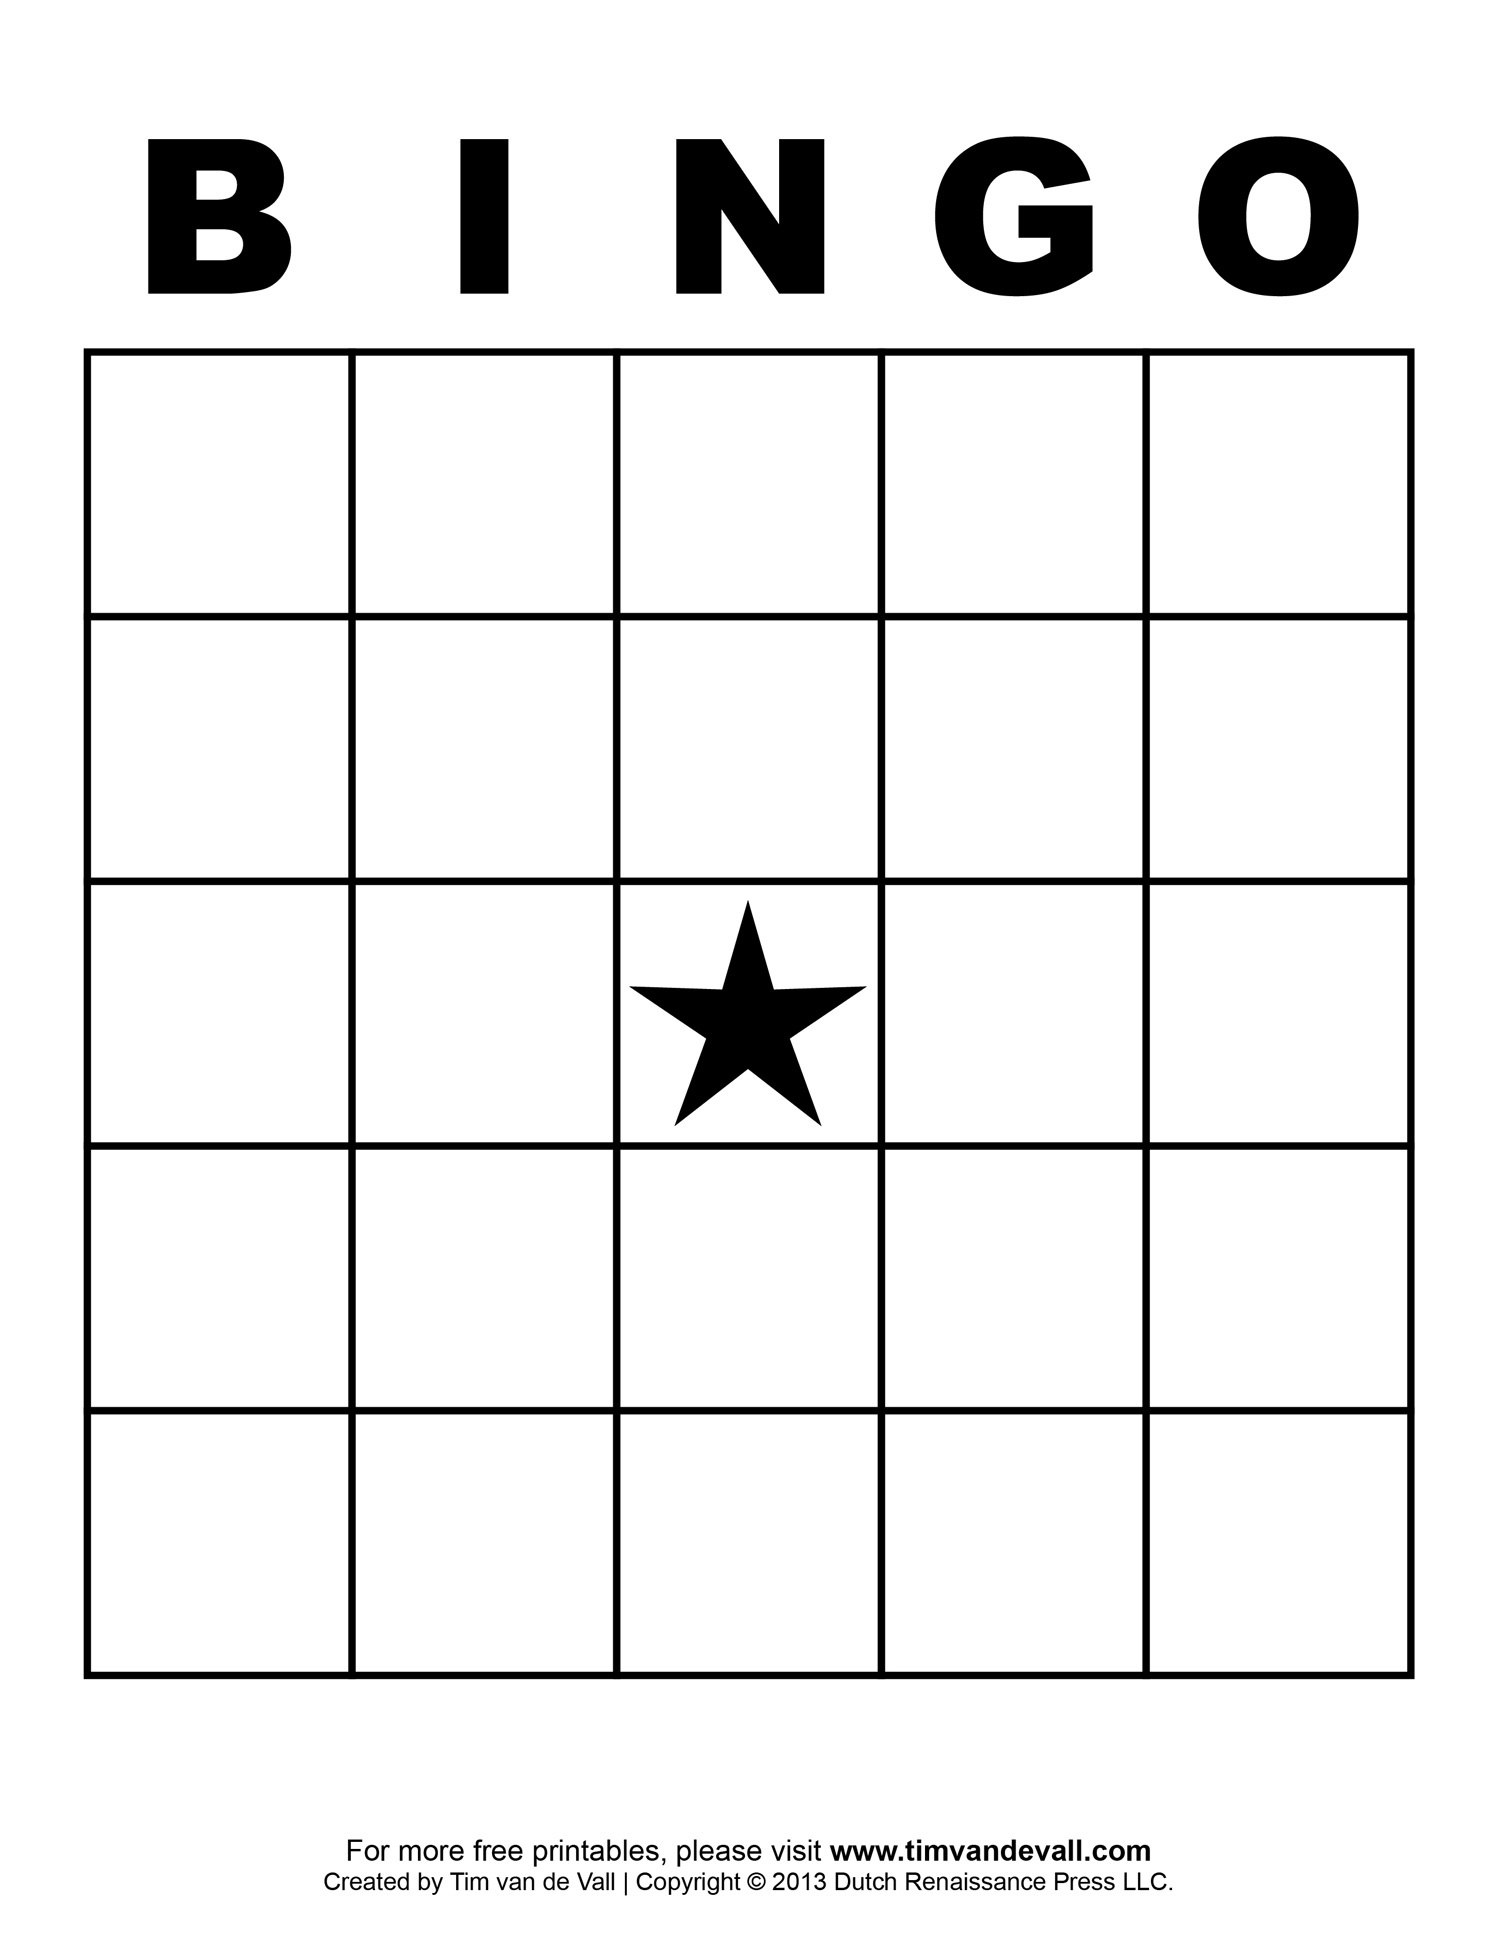 Blank Bingo Template - Tim's Printables - Free Printable Bingo Cards With Numbers